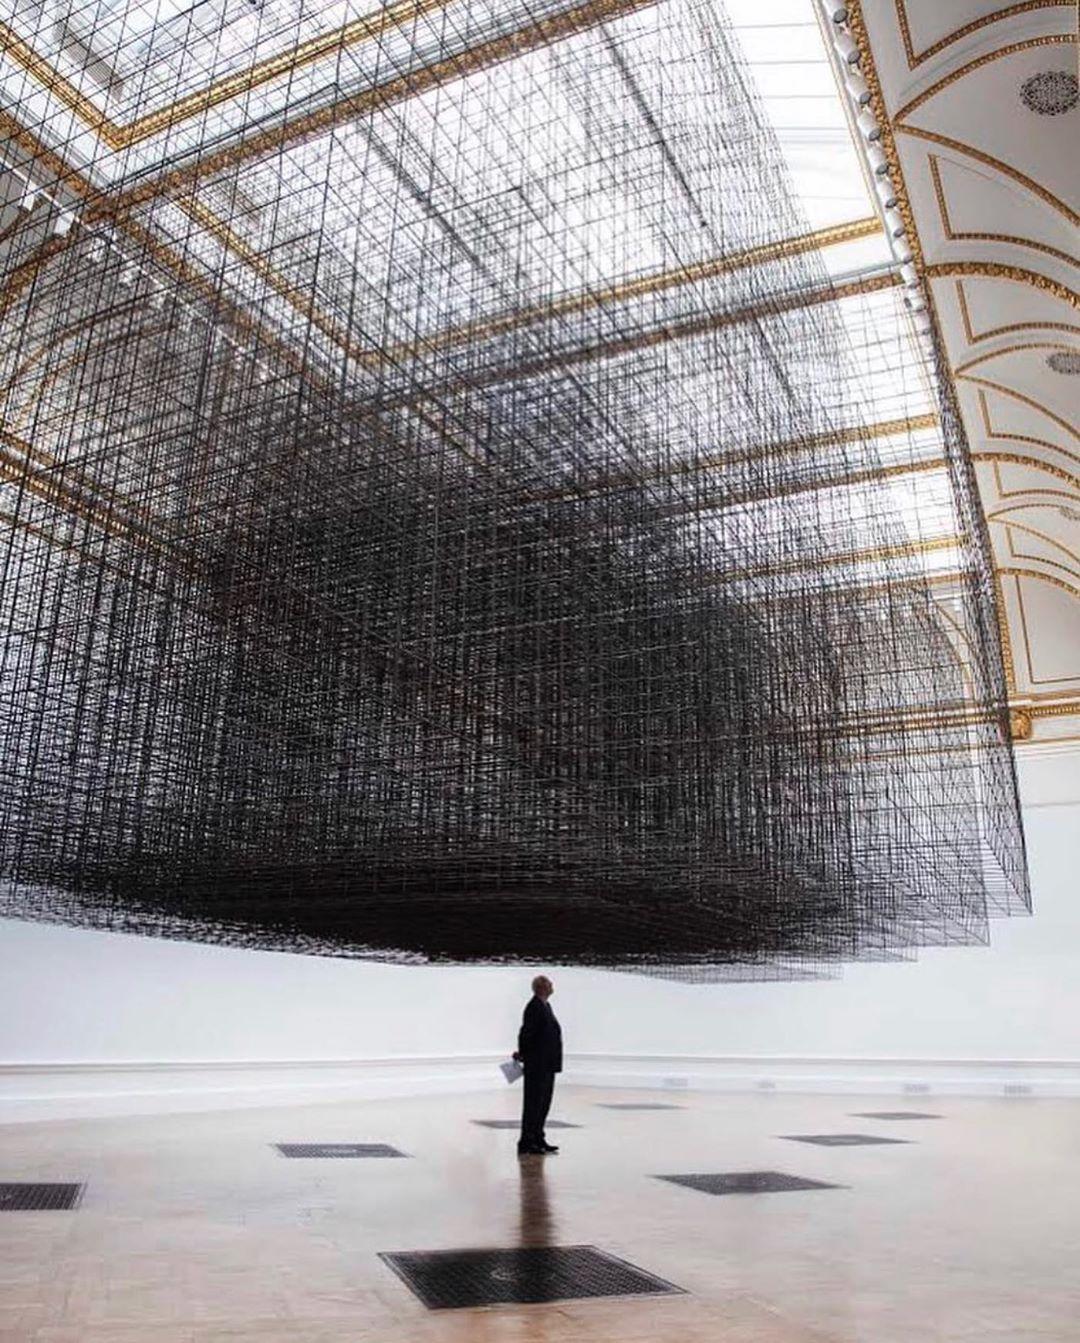 Antony Gormley, Matrix III, 2019. Installation view, 'Antony Gormley', Royal Academy of Arts, London, 21st September to 3rd December 2019.